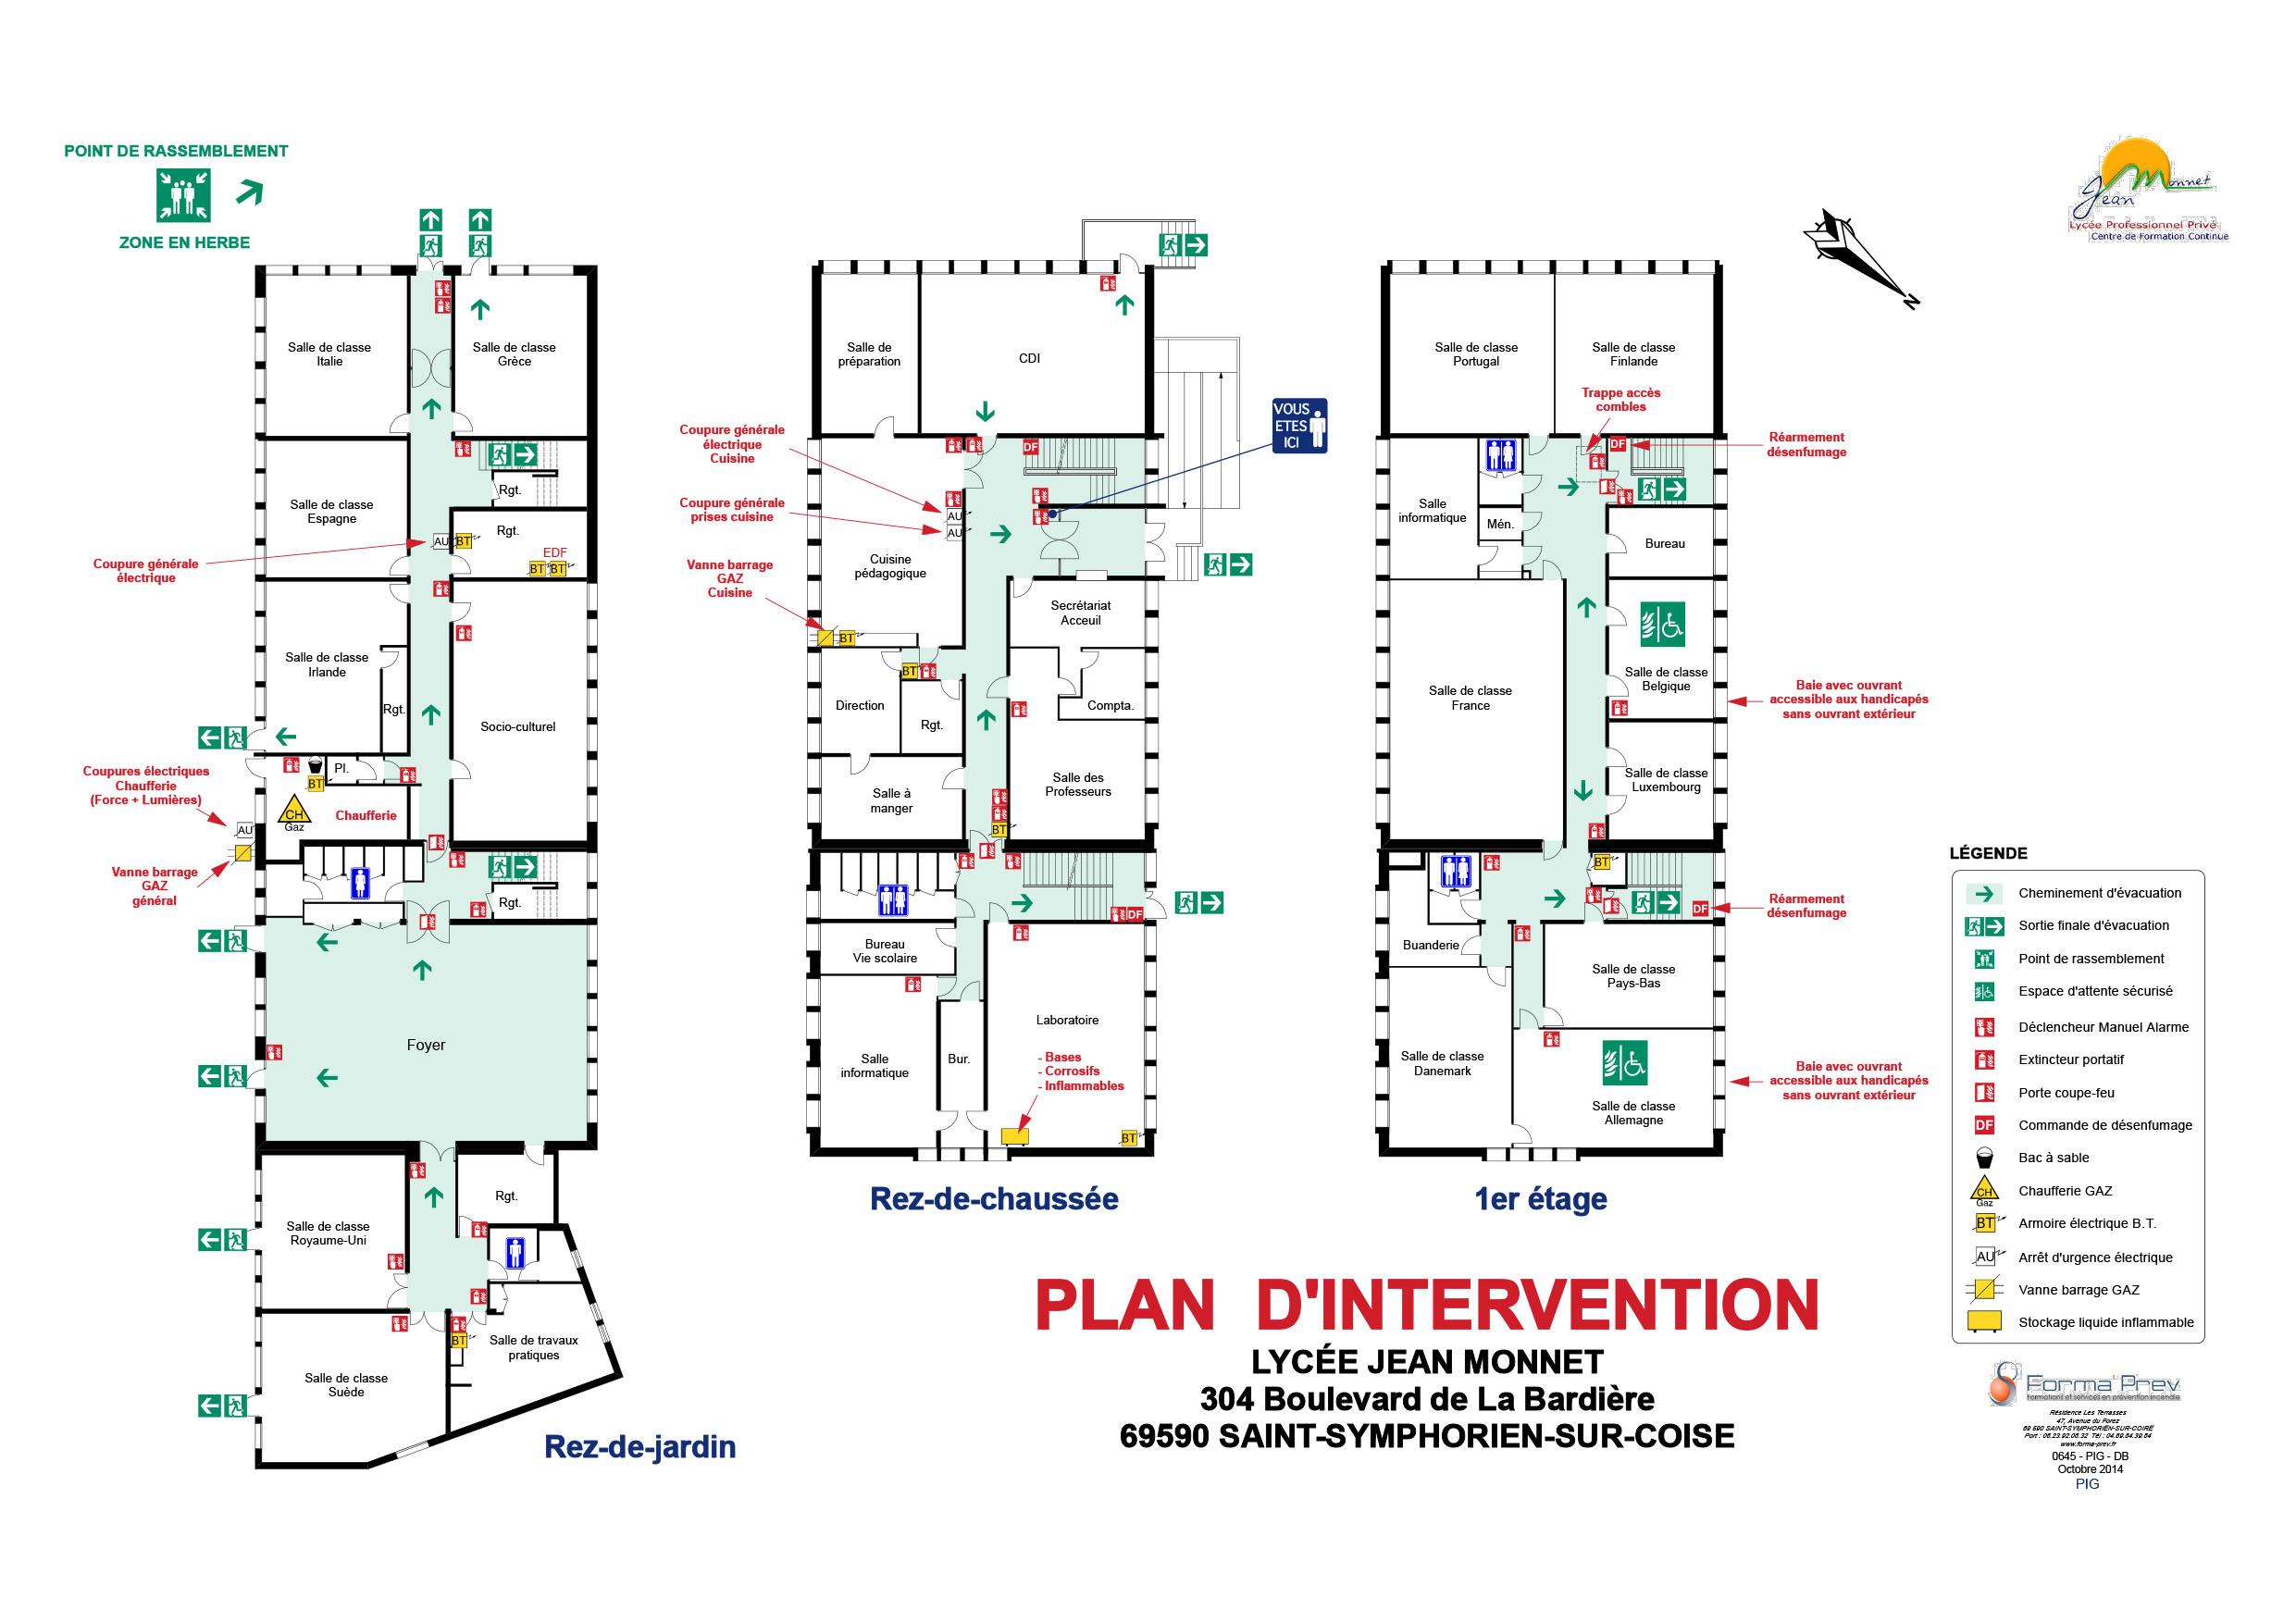 Plan d'intervention 2